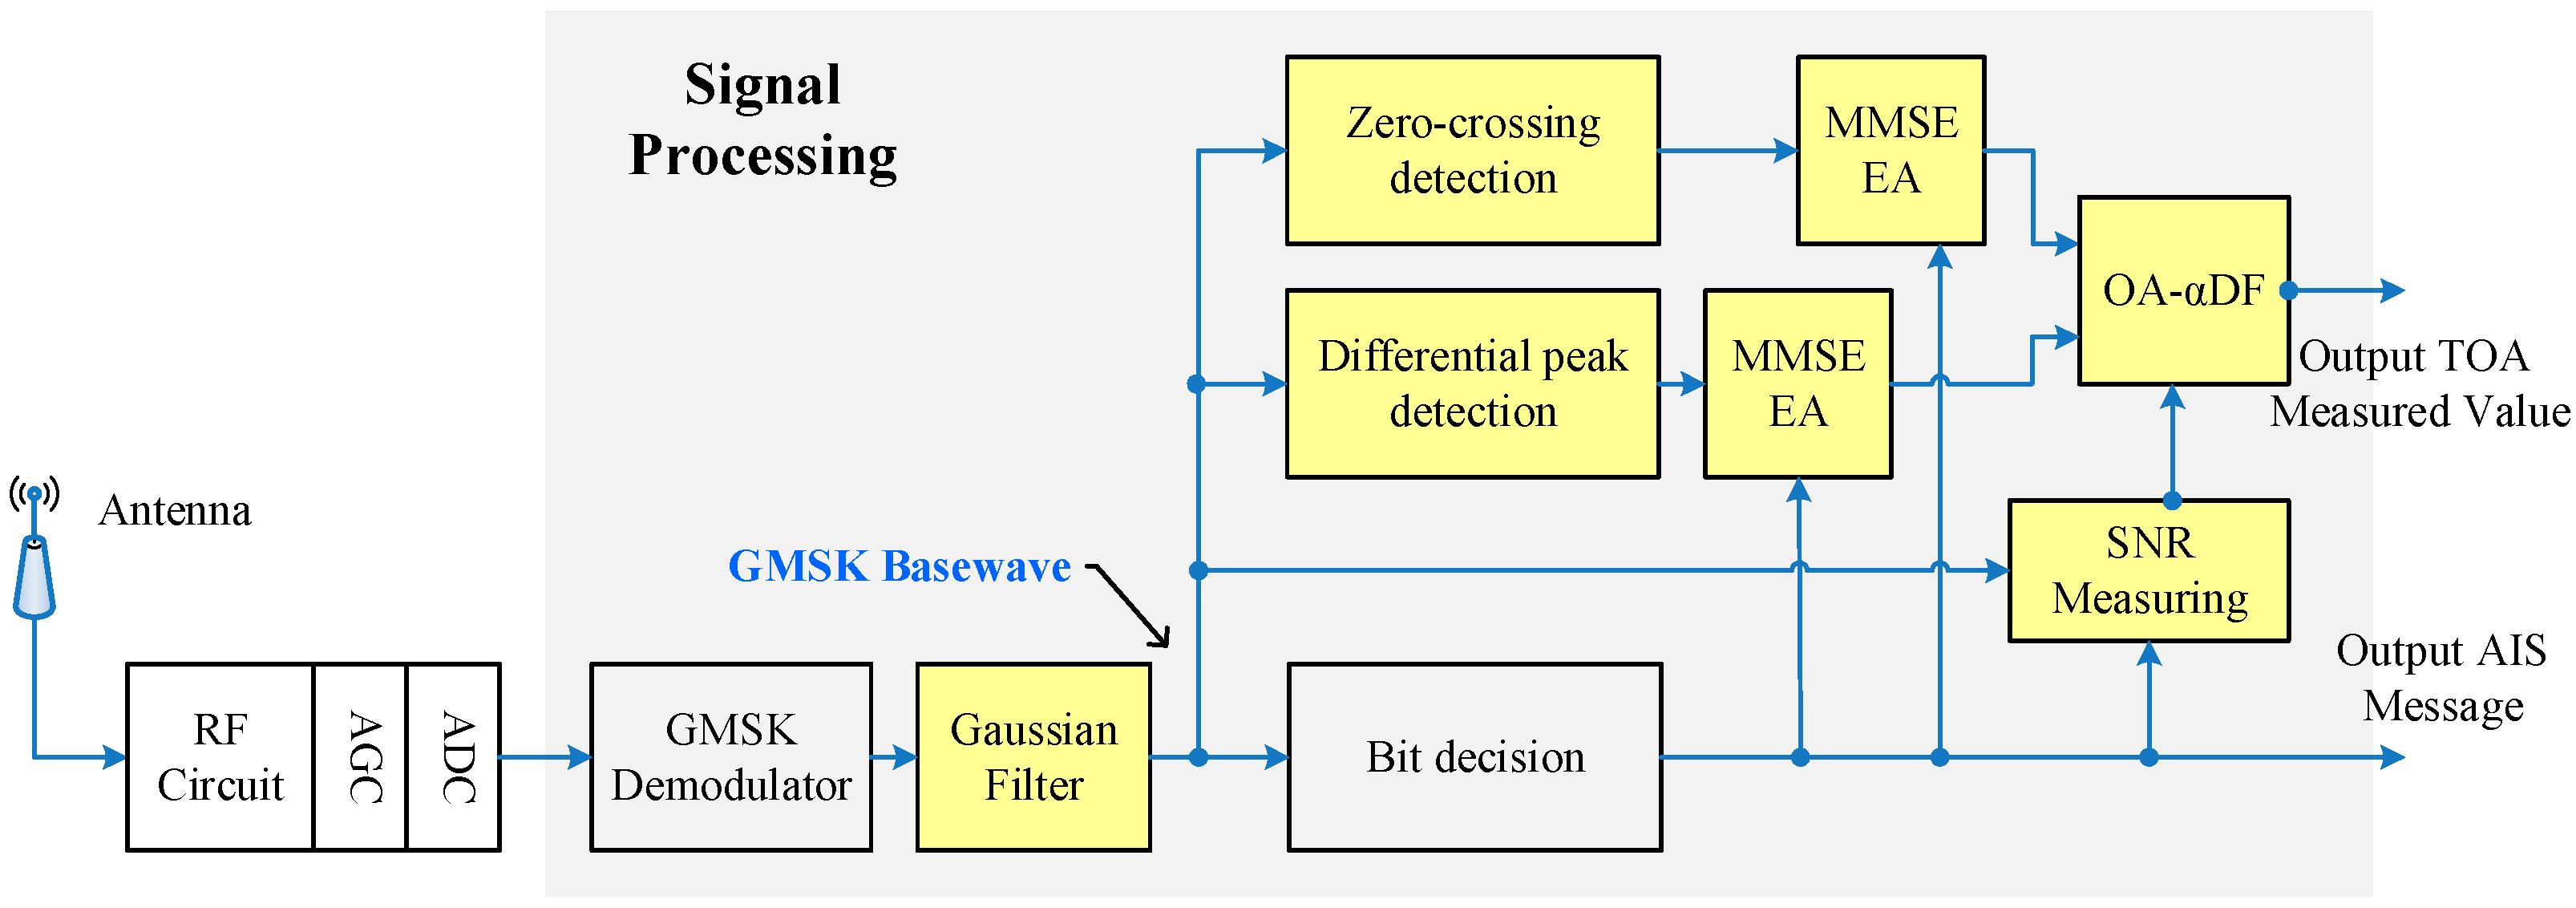 Ais Smart Radio Wiring Diagram